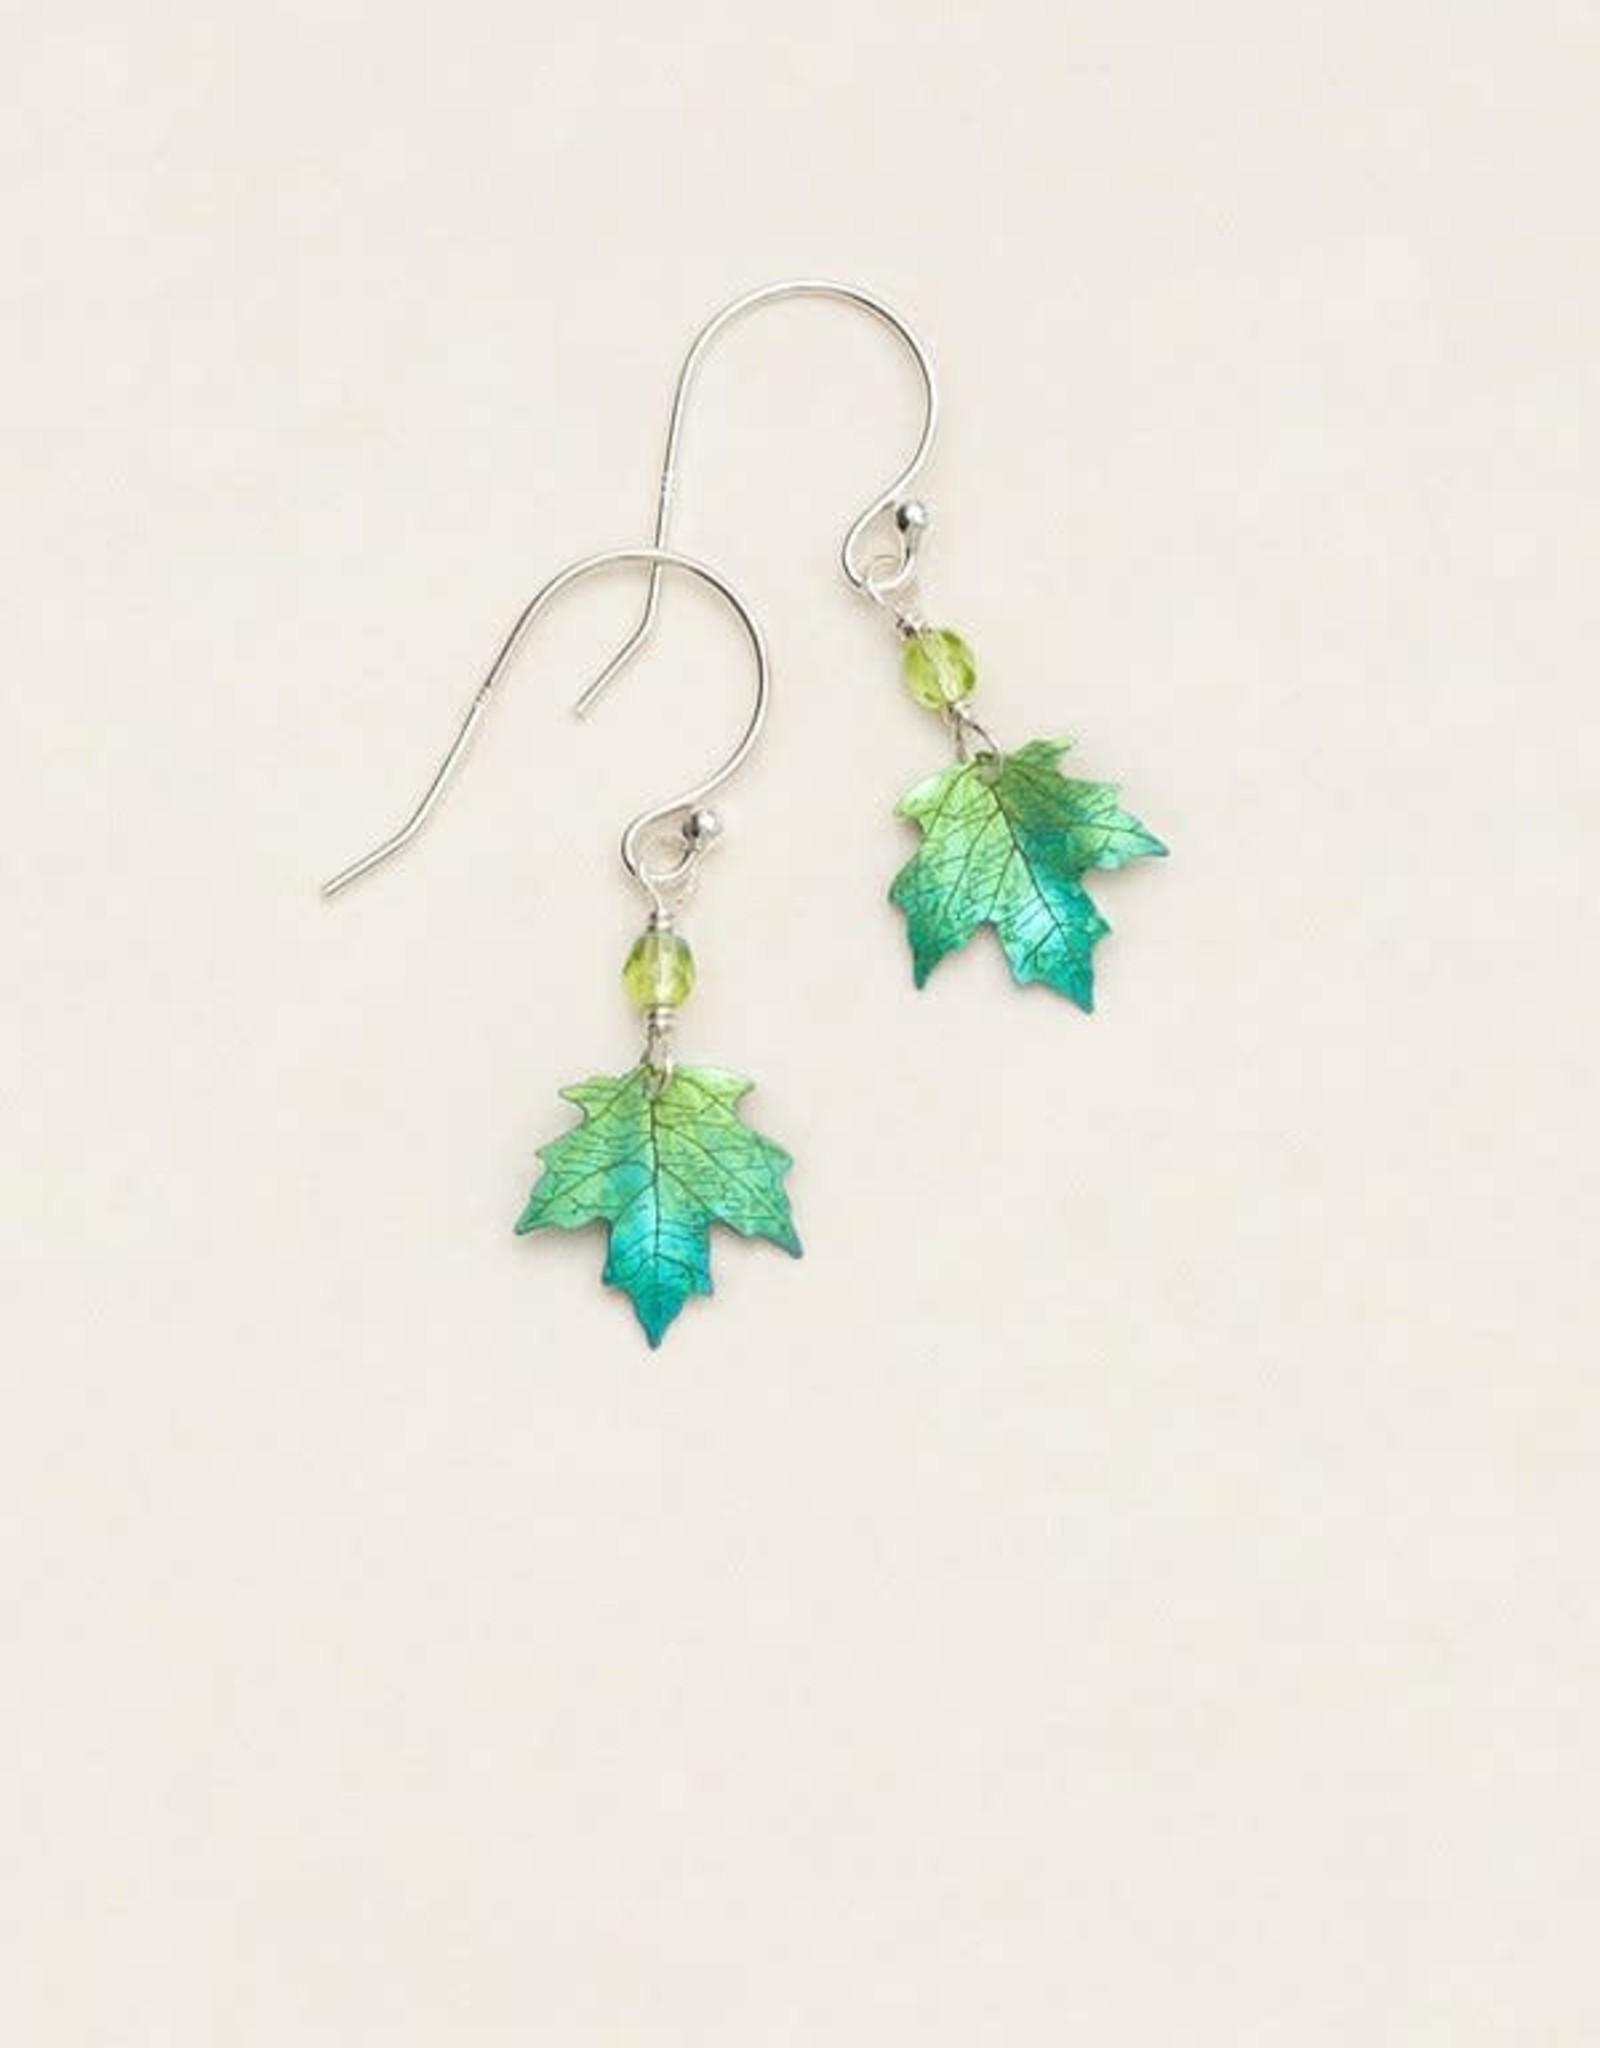 Holly Yashi Green Petite Sugar Maple Earrings